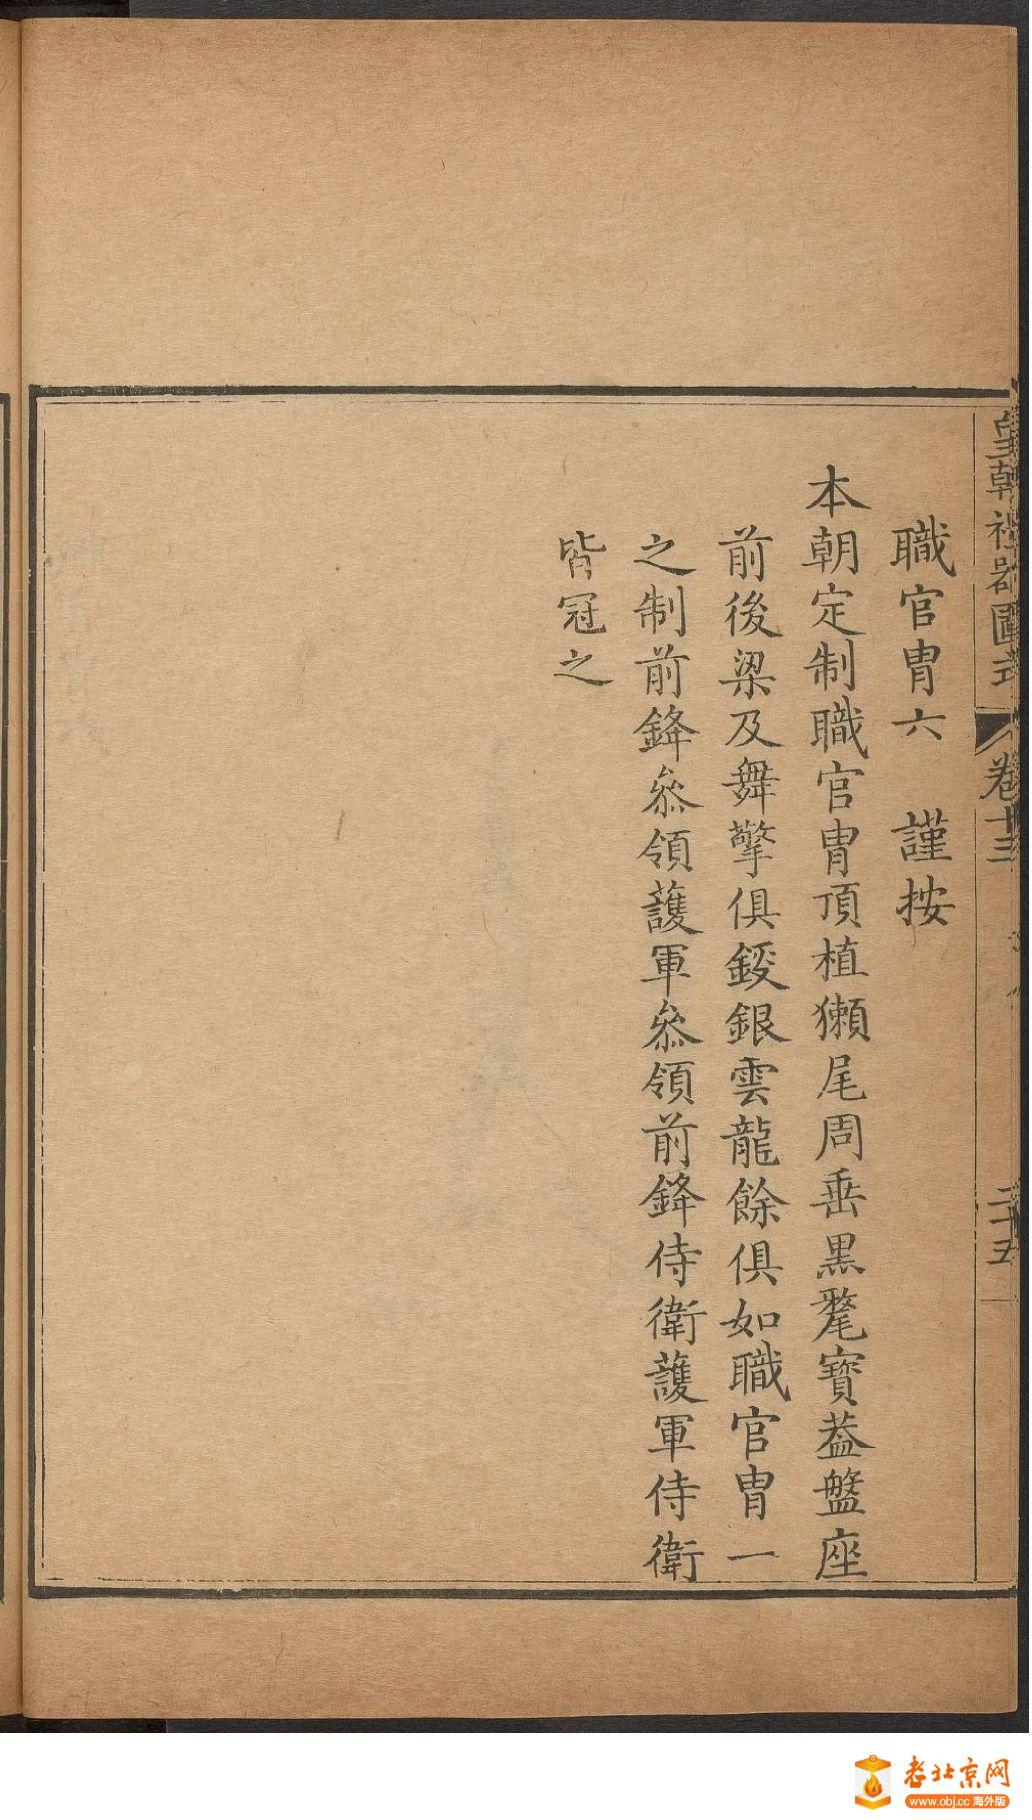 3_page6_image1b.jpg